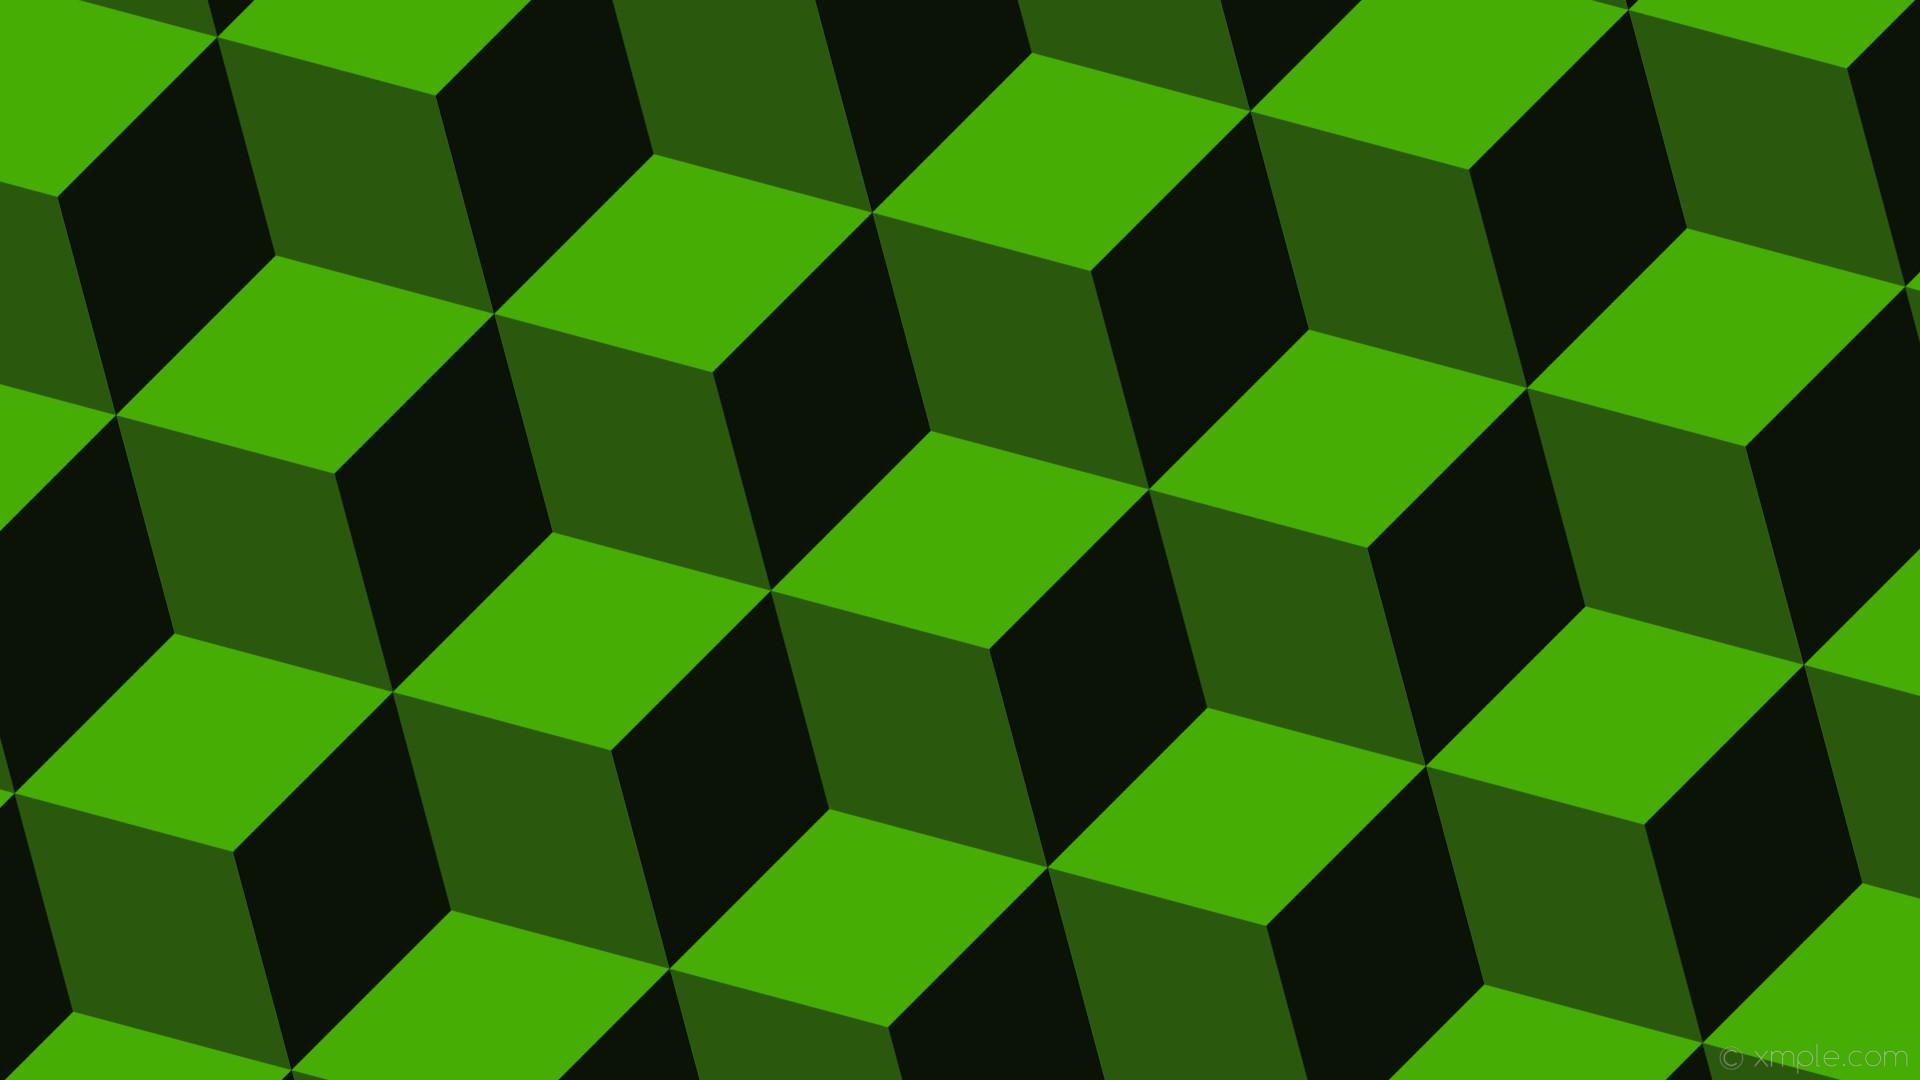 wallpaper black 3d cubes lime dark lime #46ad04 #2a580d #0b1206 195° 226px